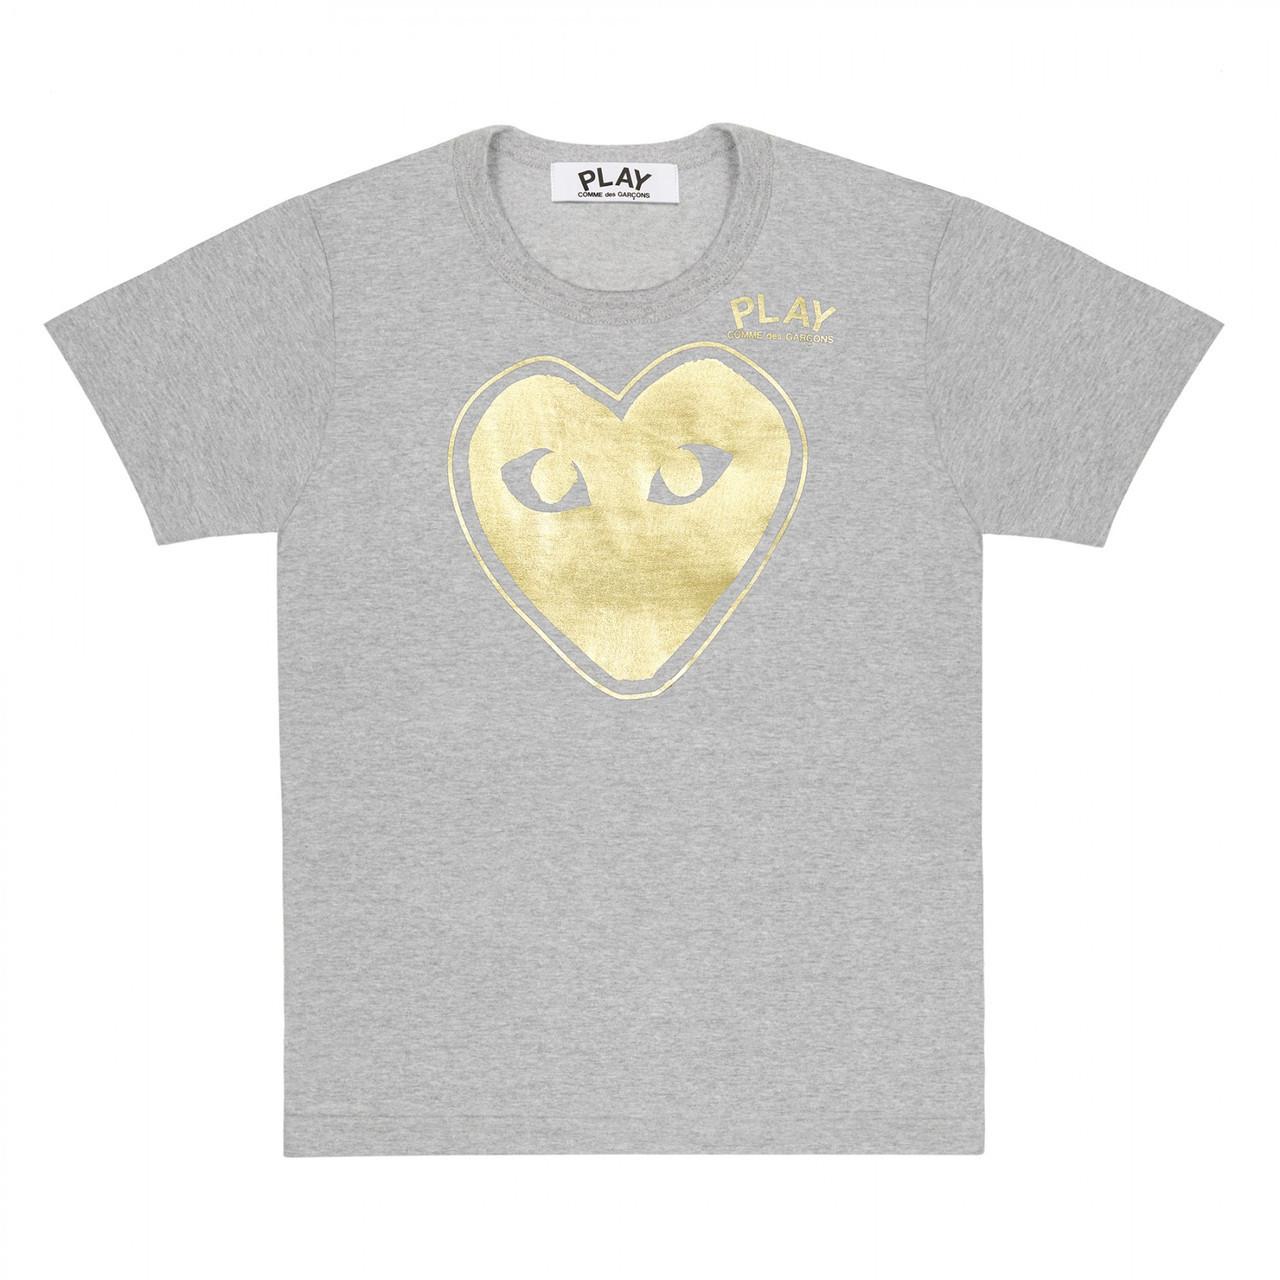 Футболка с принтом Comme des Garcons Double Heart Logo мужская